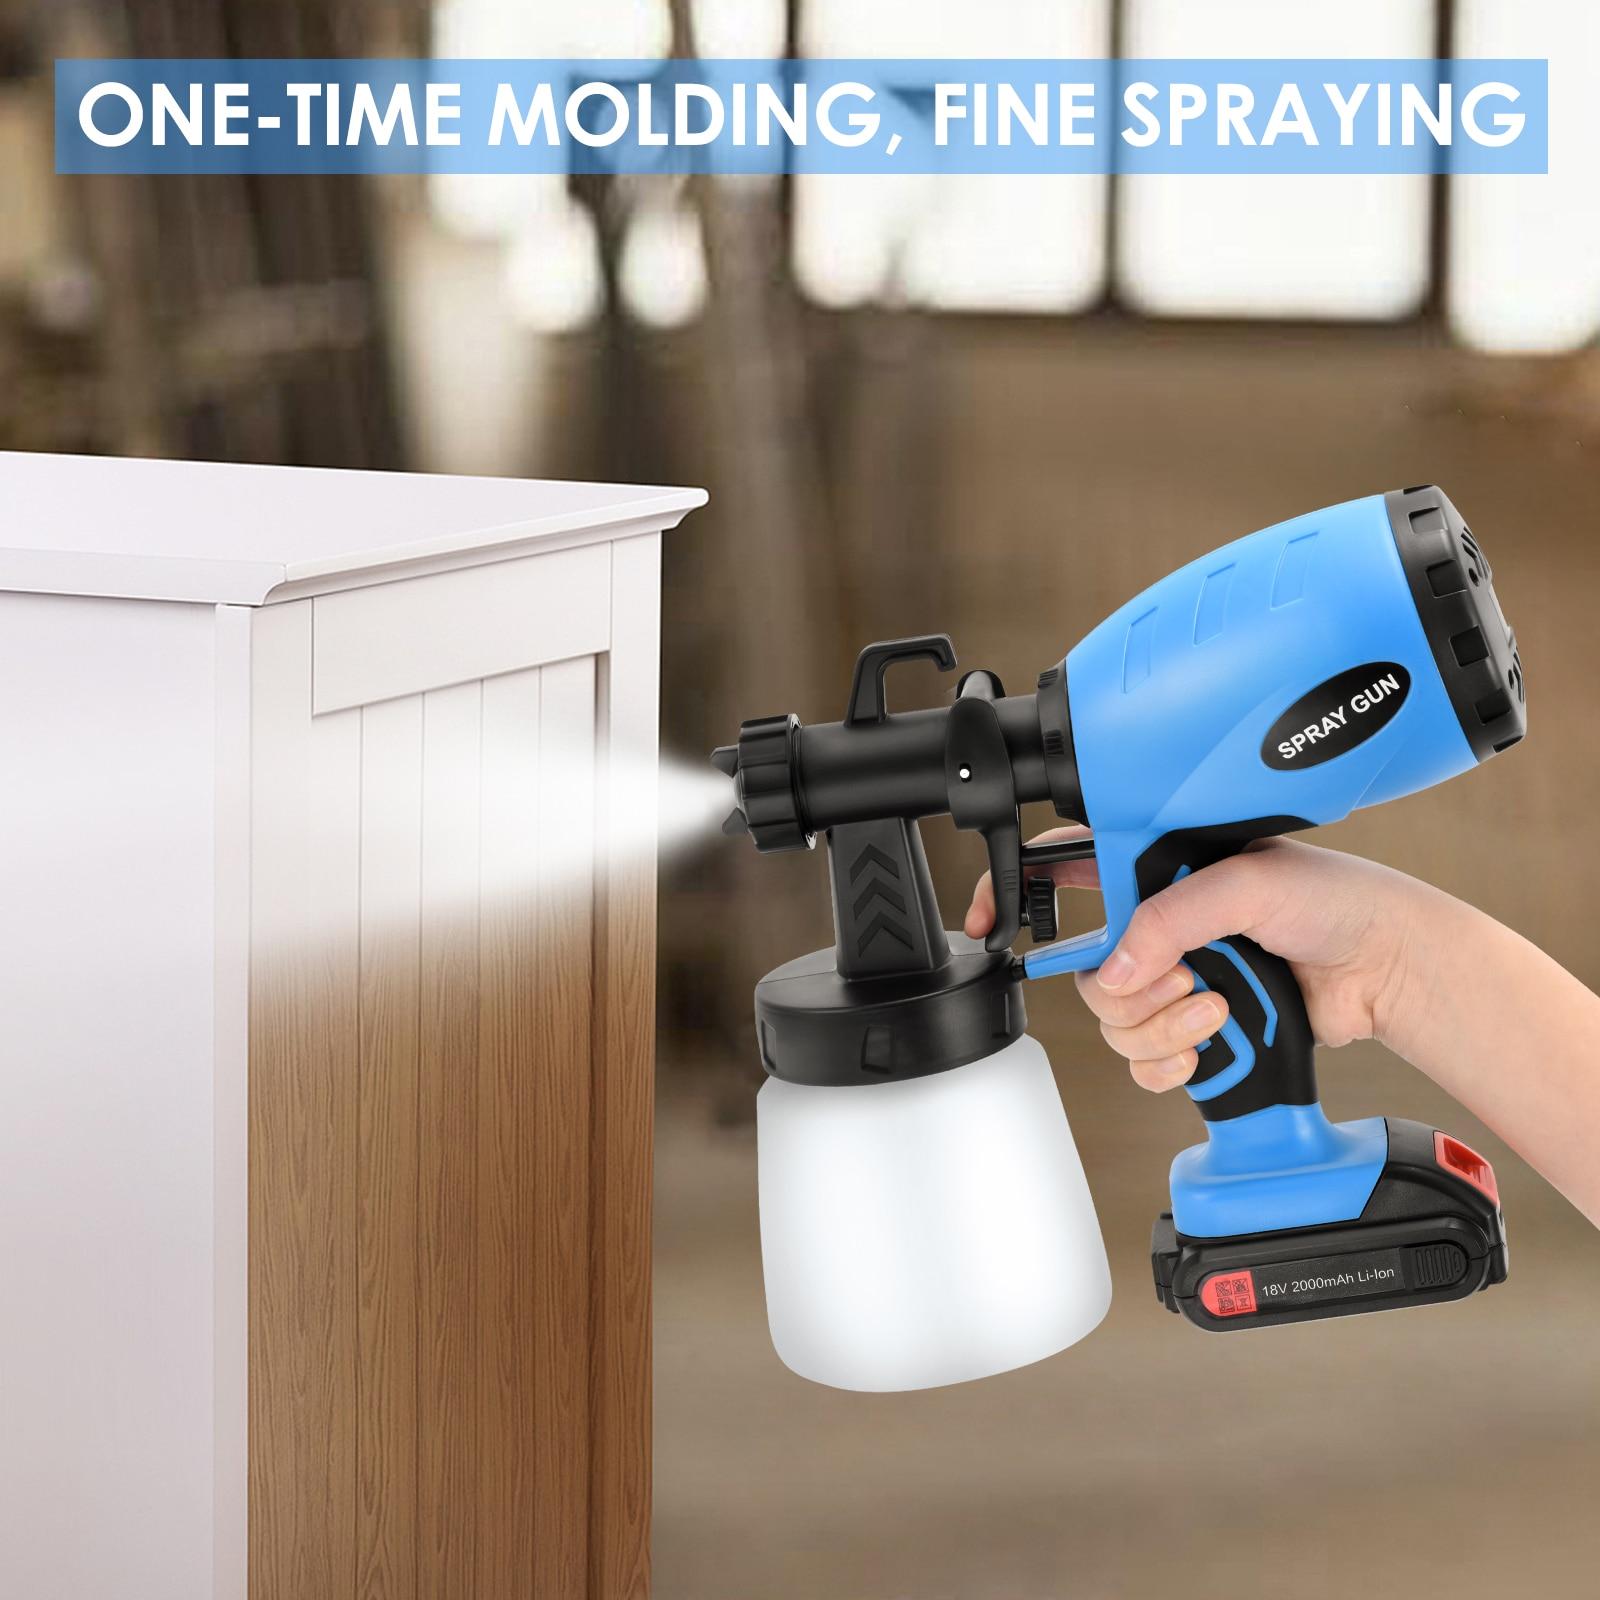 800ML Cordless Electric Spray Gun With 3 Spraying Modes Household Flow Control HVLP Airbrush Sprayer Tool Portable Paint Sprayer